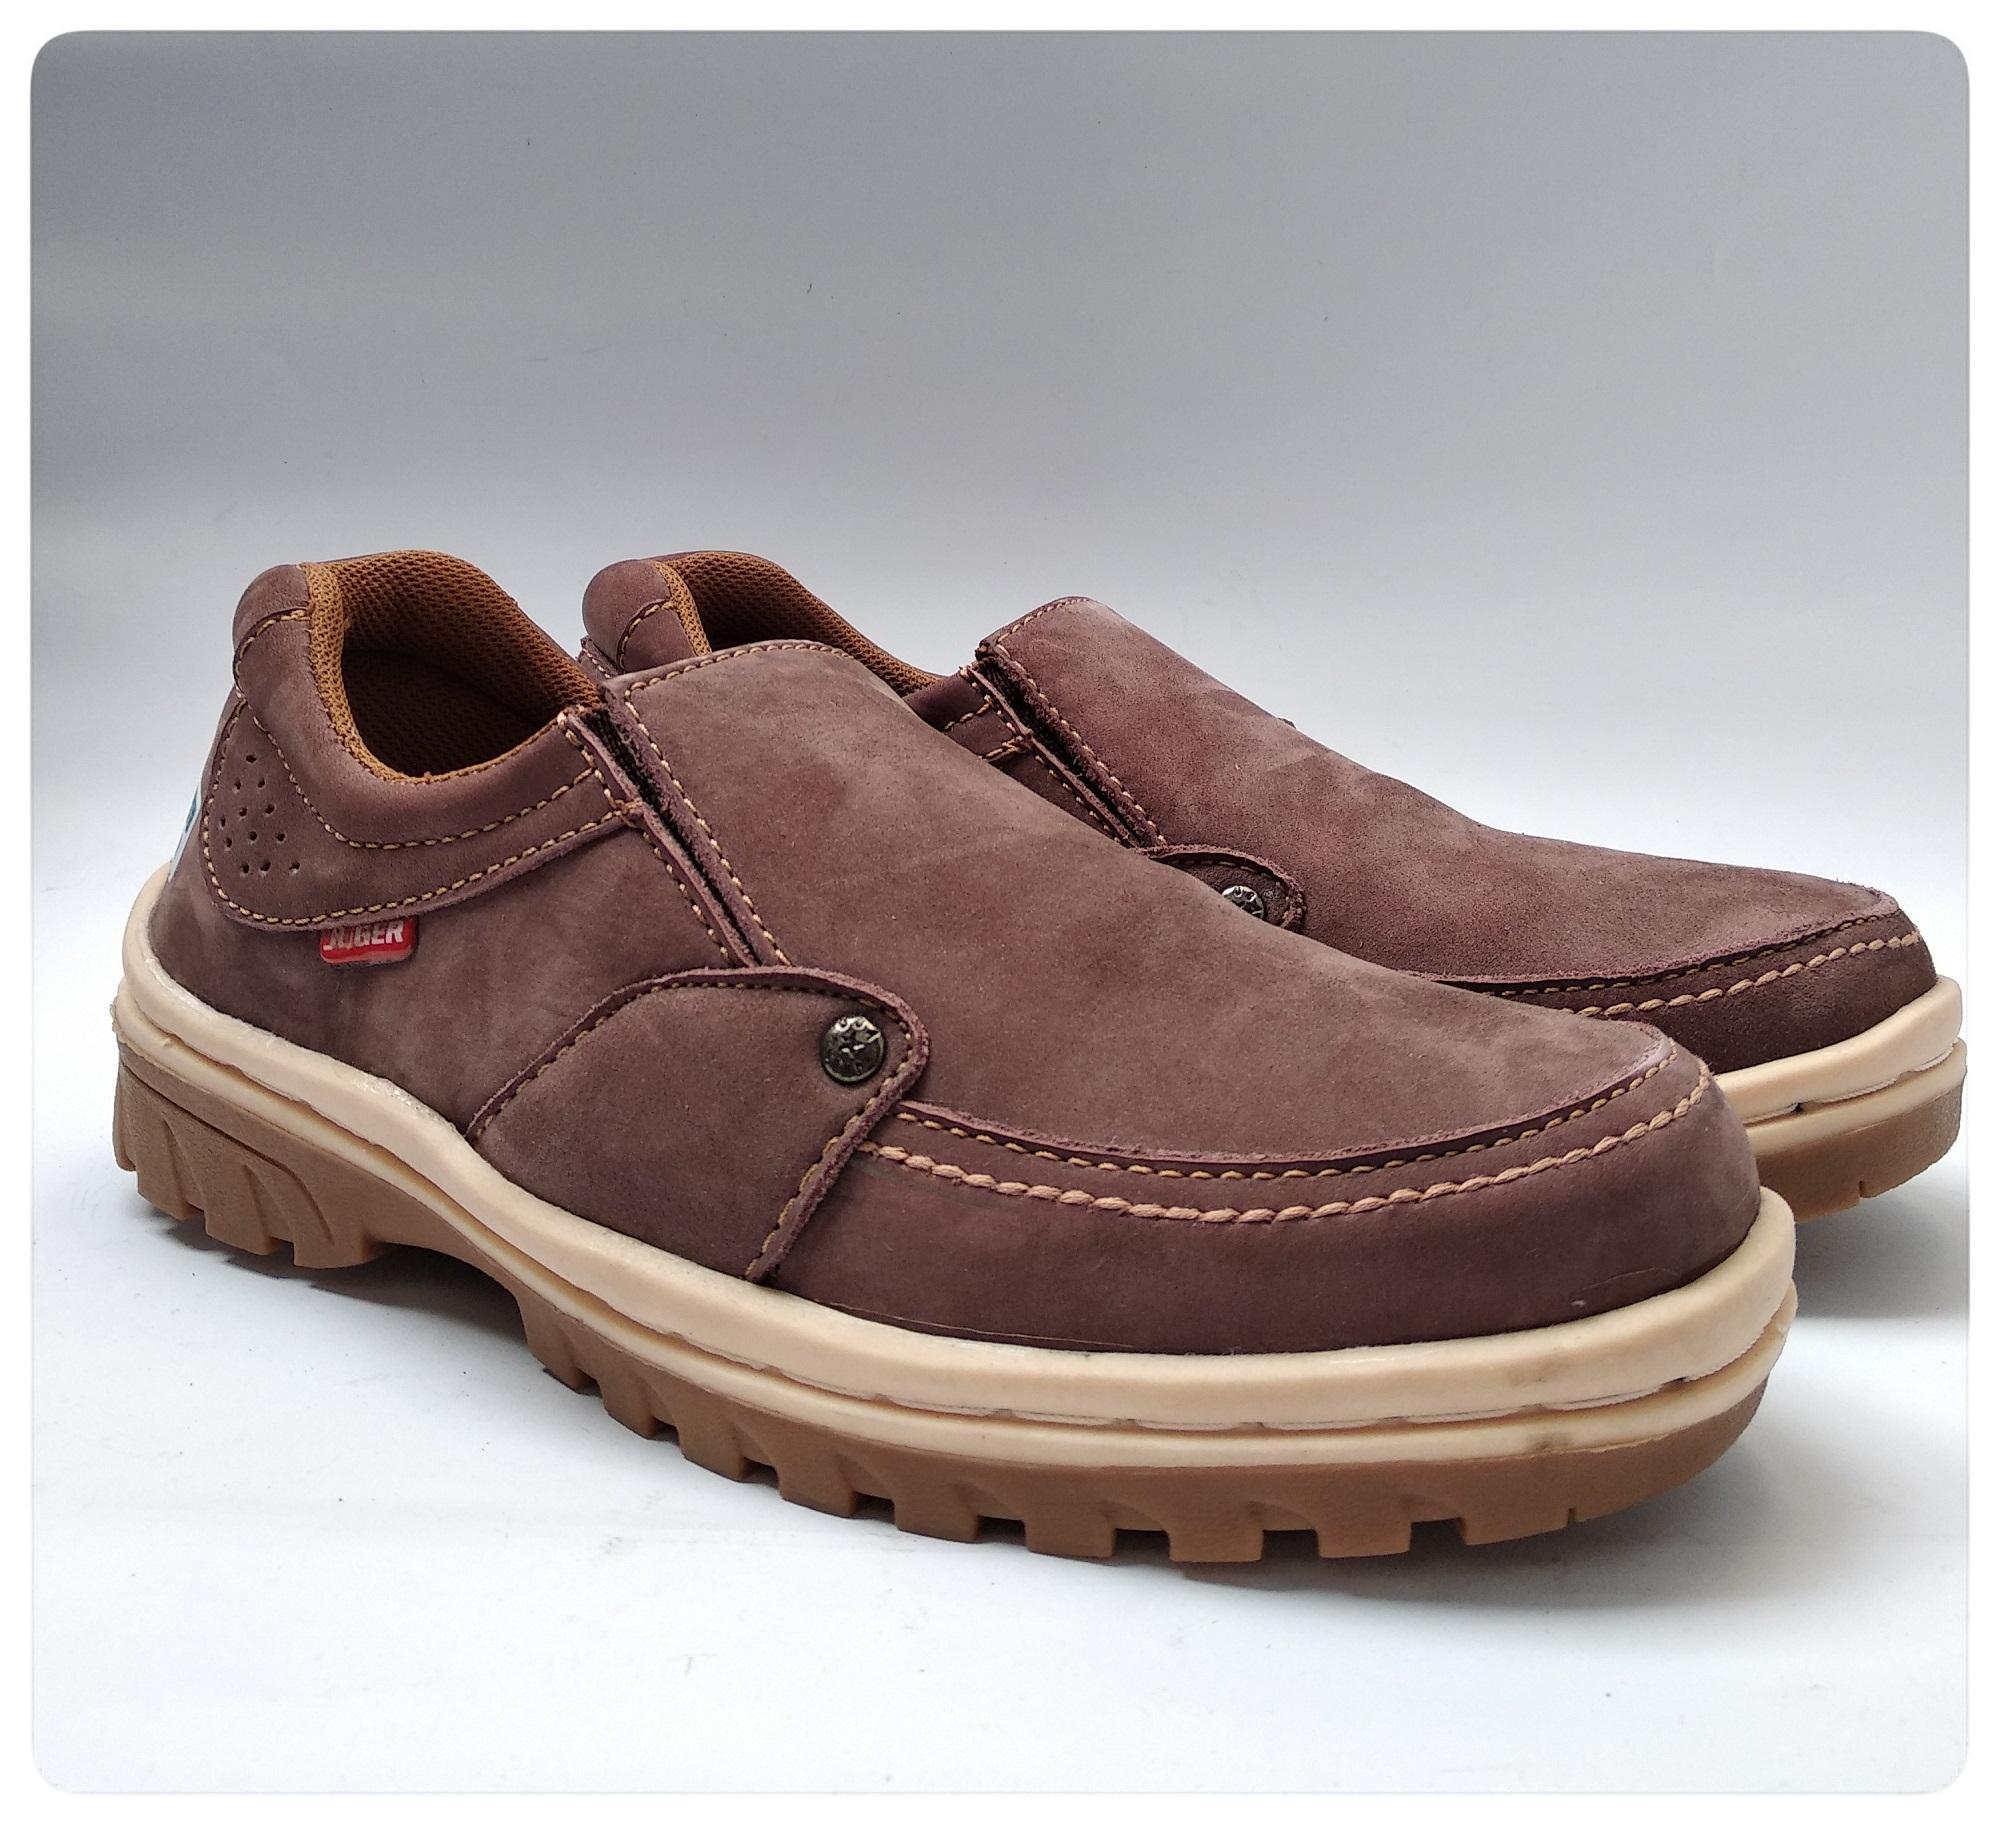 hamursepatu   sepatu kulit pria   sepatu kerja   sepatu slip on pria    sepatu santai dbbde1f3f6